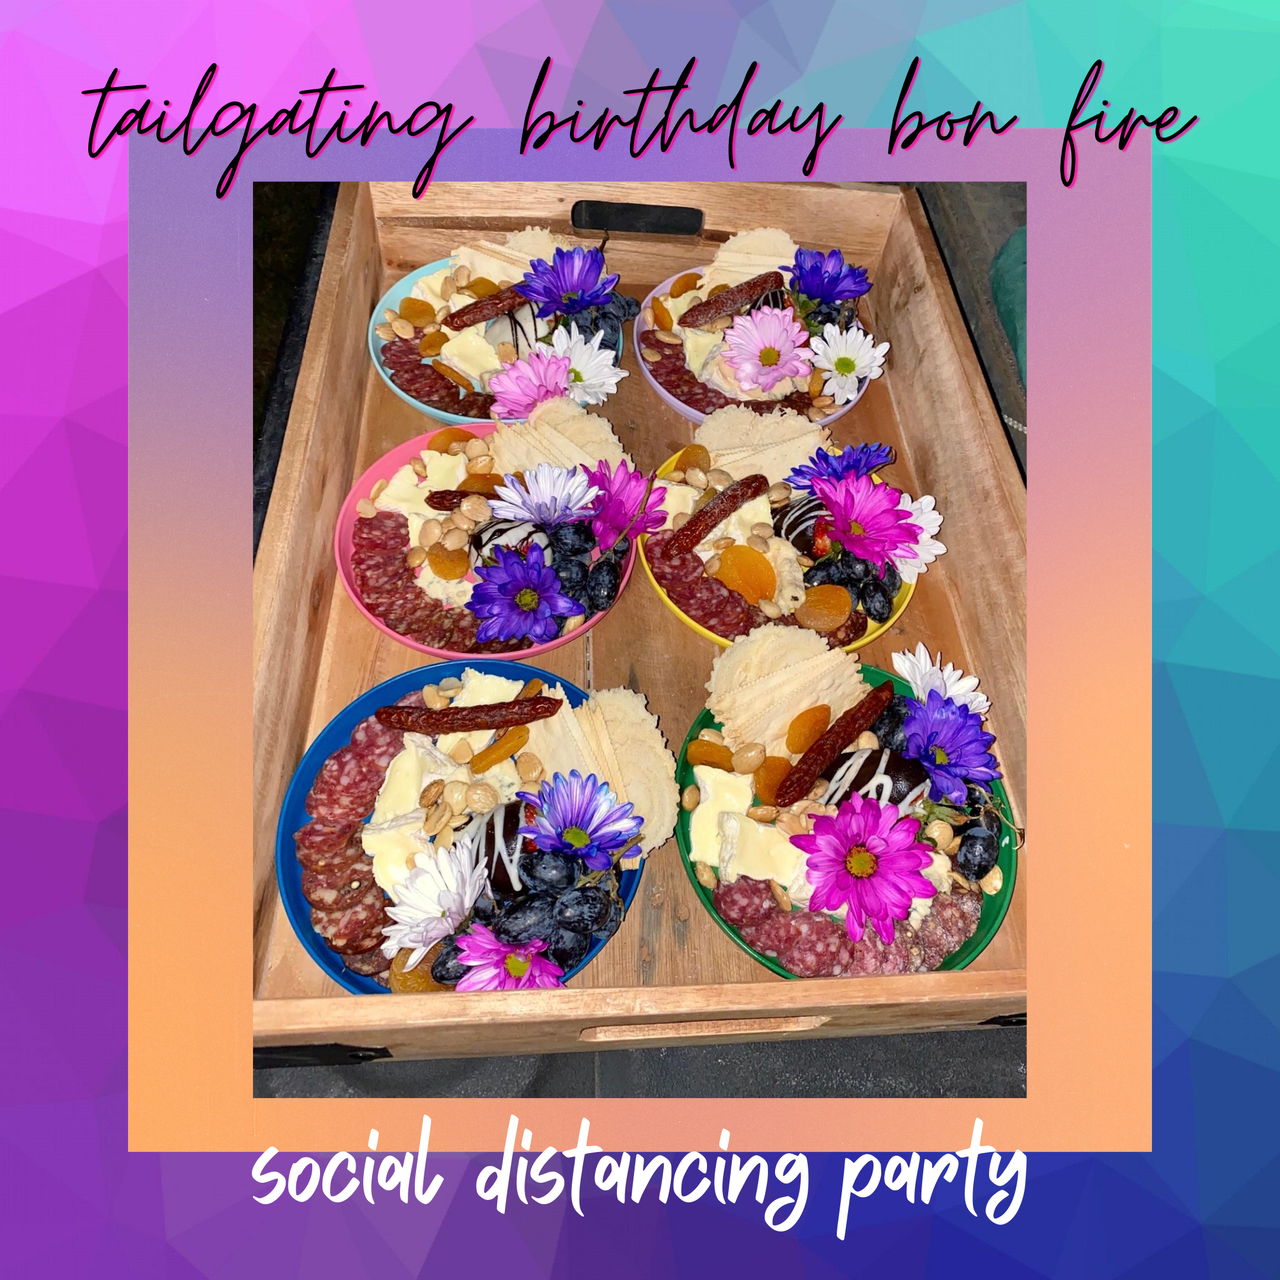 birthdaybonfiresocialdistance.png